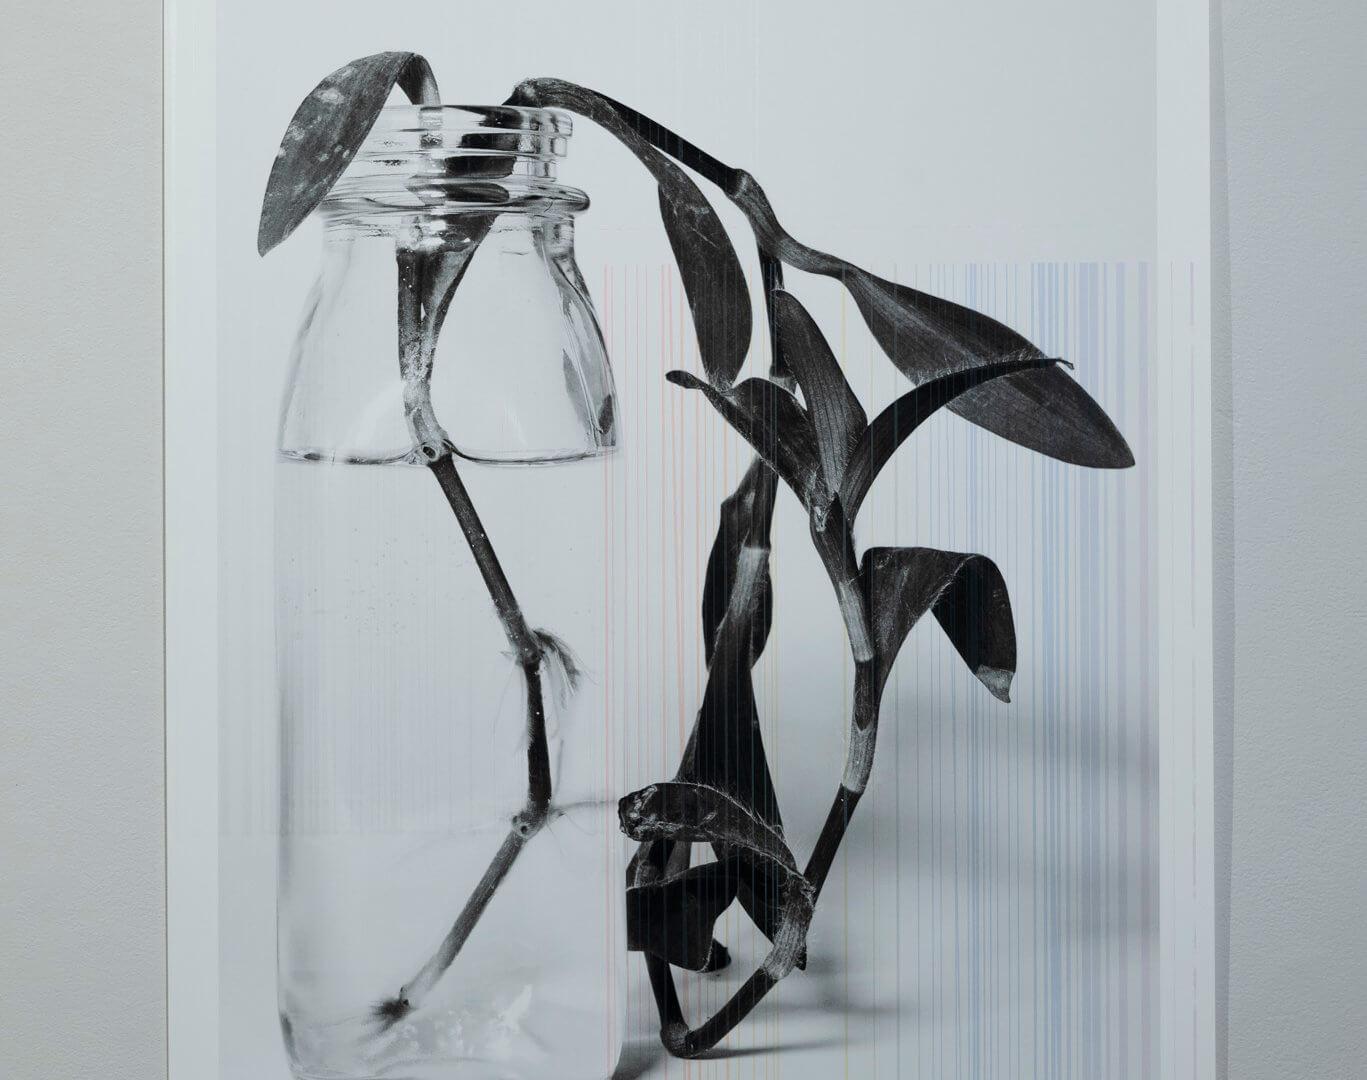 "Futures Barren Film Stills: III by April Dean. Inkjet and screen print. 36 x 24"". 2019. Image credit: Sarah Fuller."